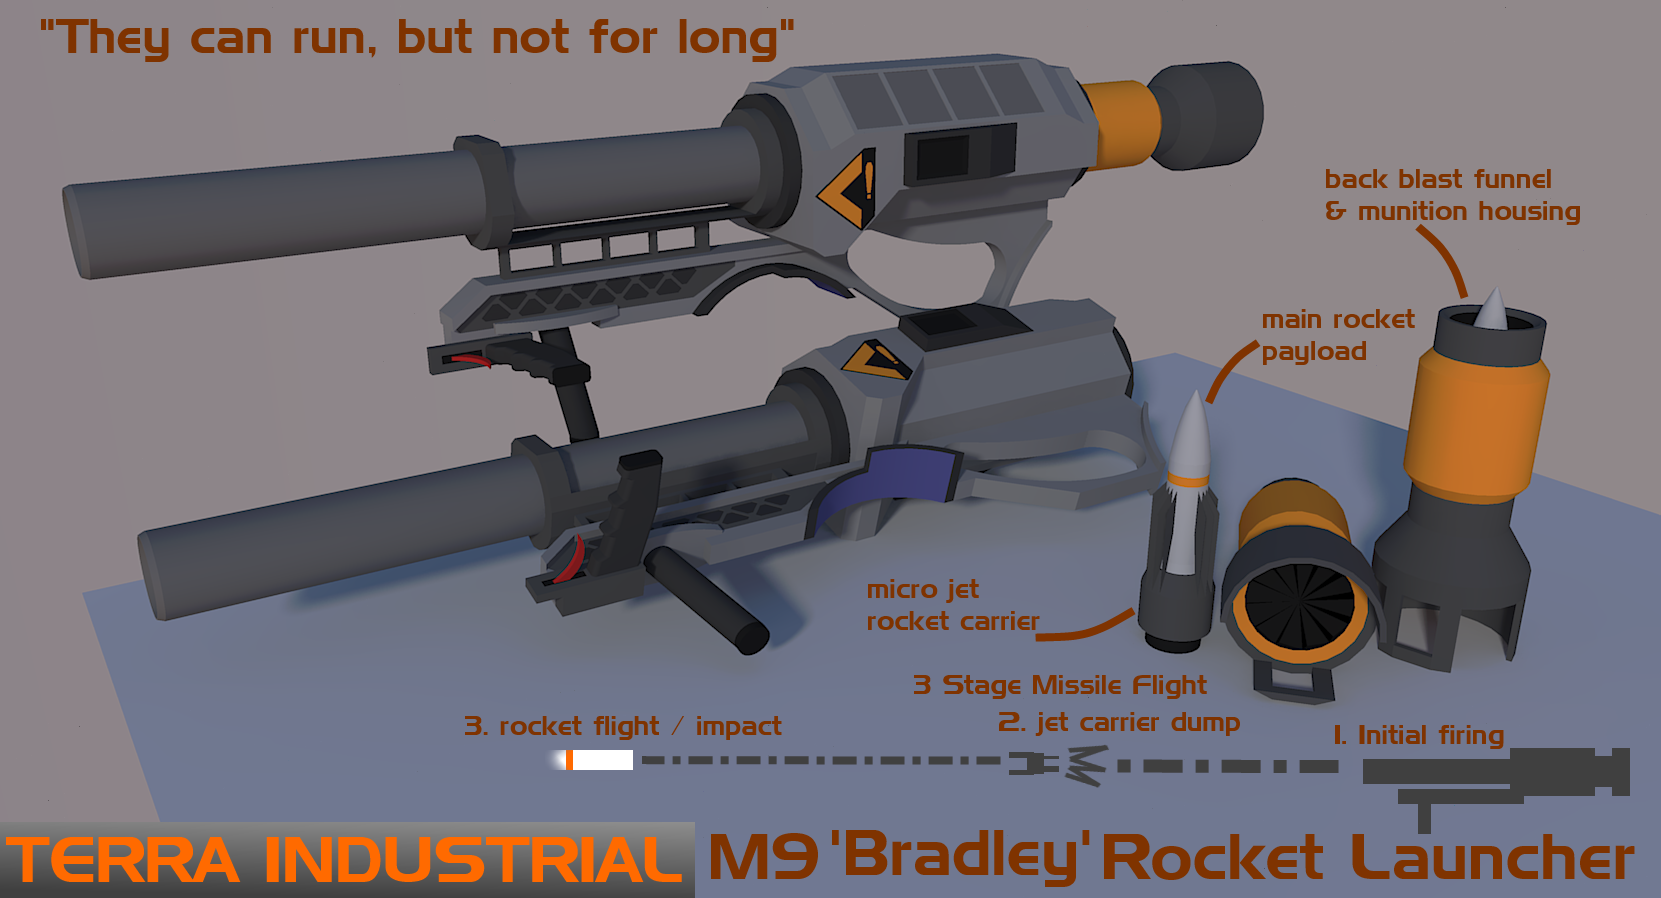 M9 Bradley Rocket Launcher by Gwentari